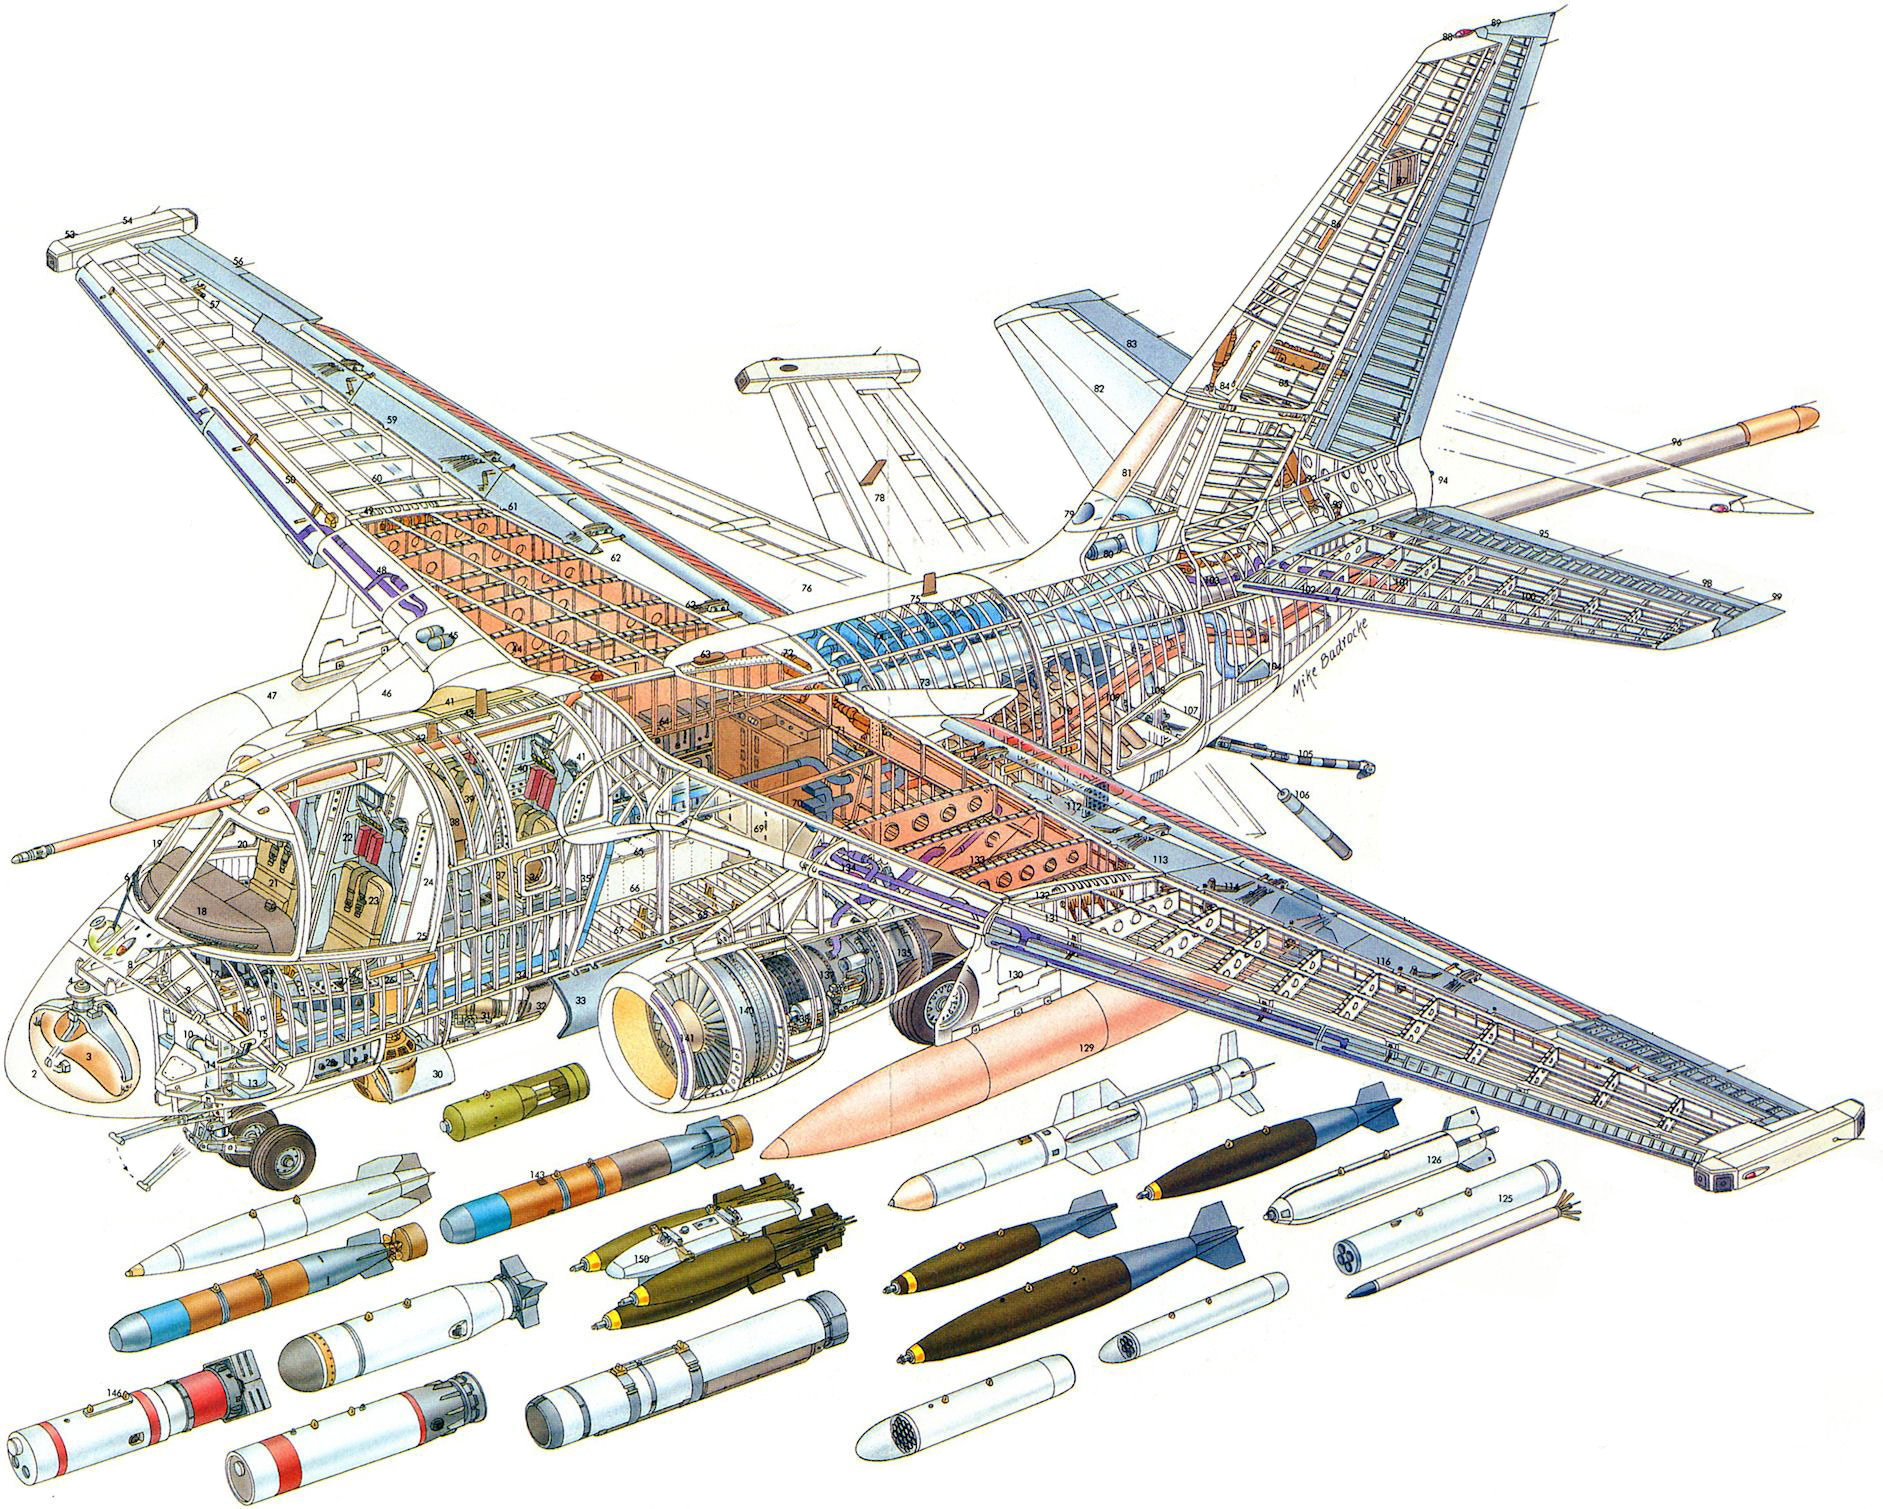 Lockheed S-3 Viking cutaway drawing